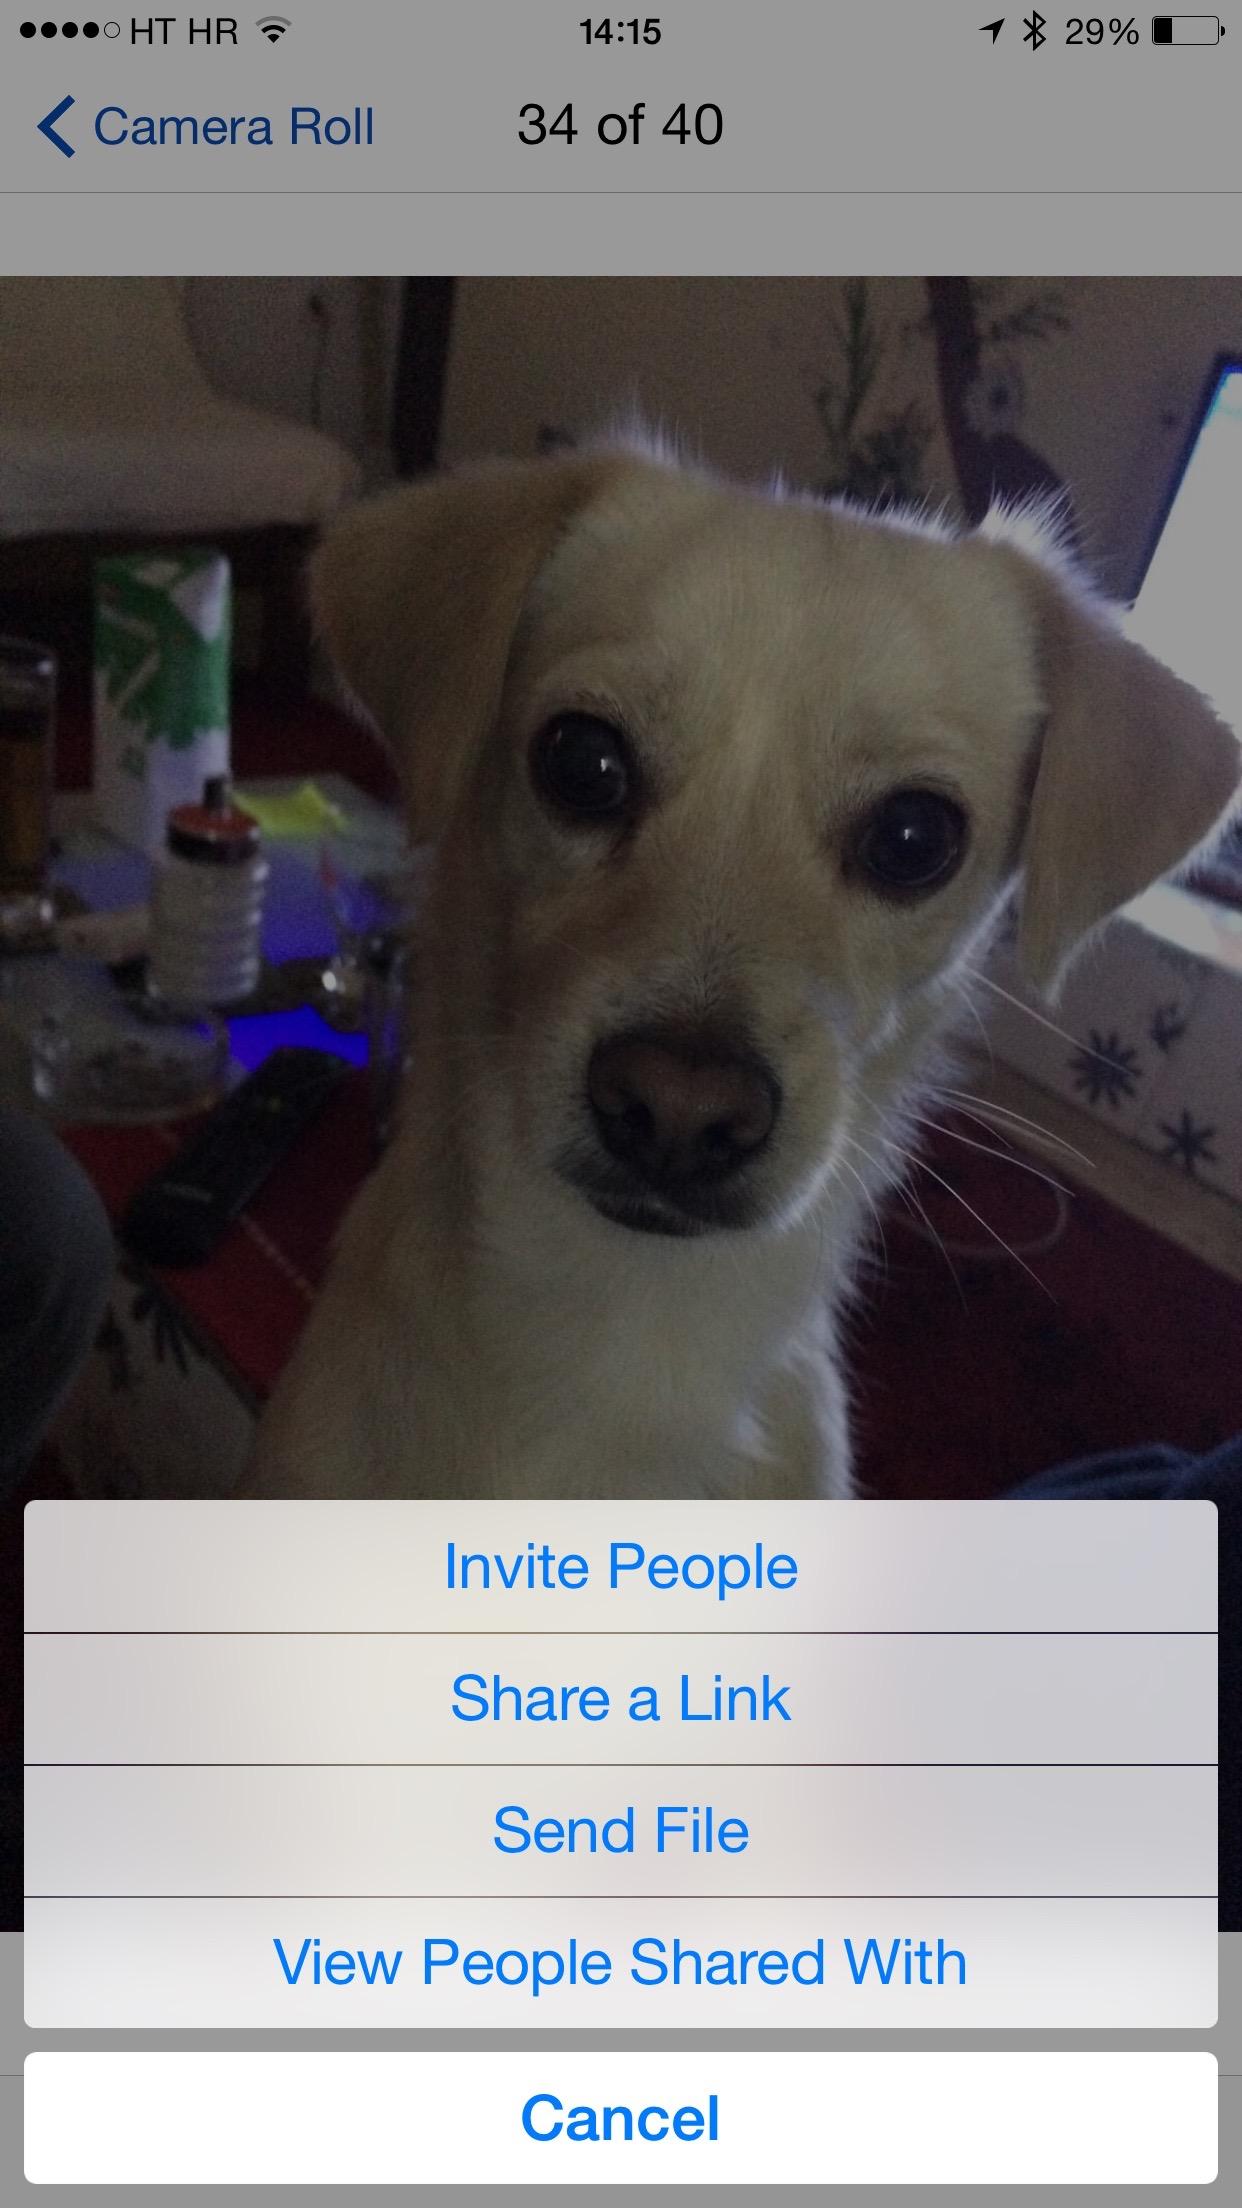 Captura de pantalla 002 de OneDrive 5.5 para iOS iPhone